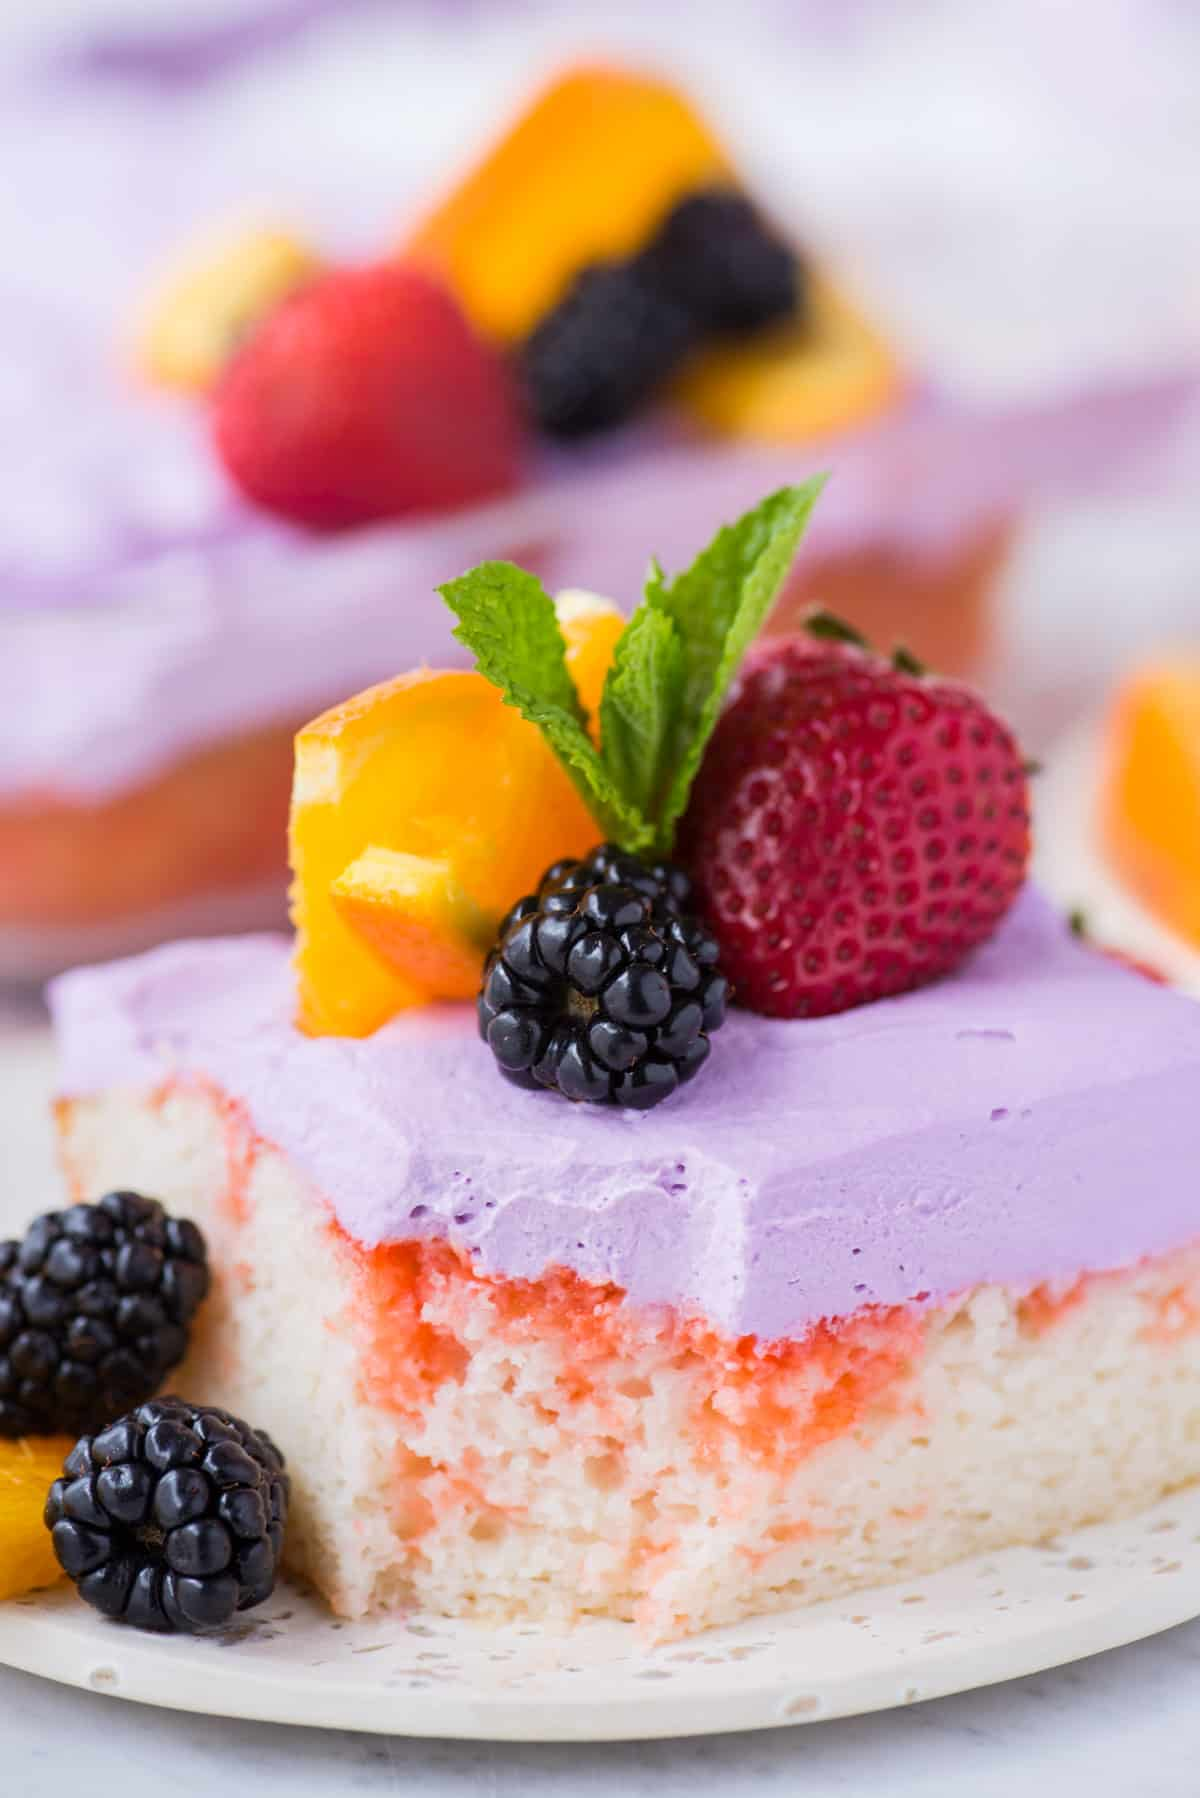 slice of sangria poke cake garnished with a strawberry, blackberries, orange slice and mint leaf on white plate